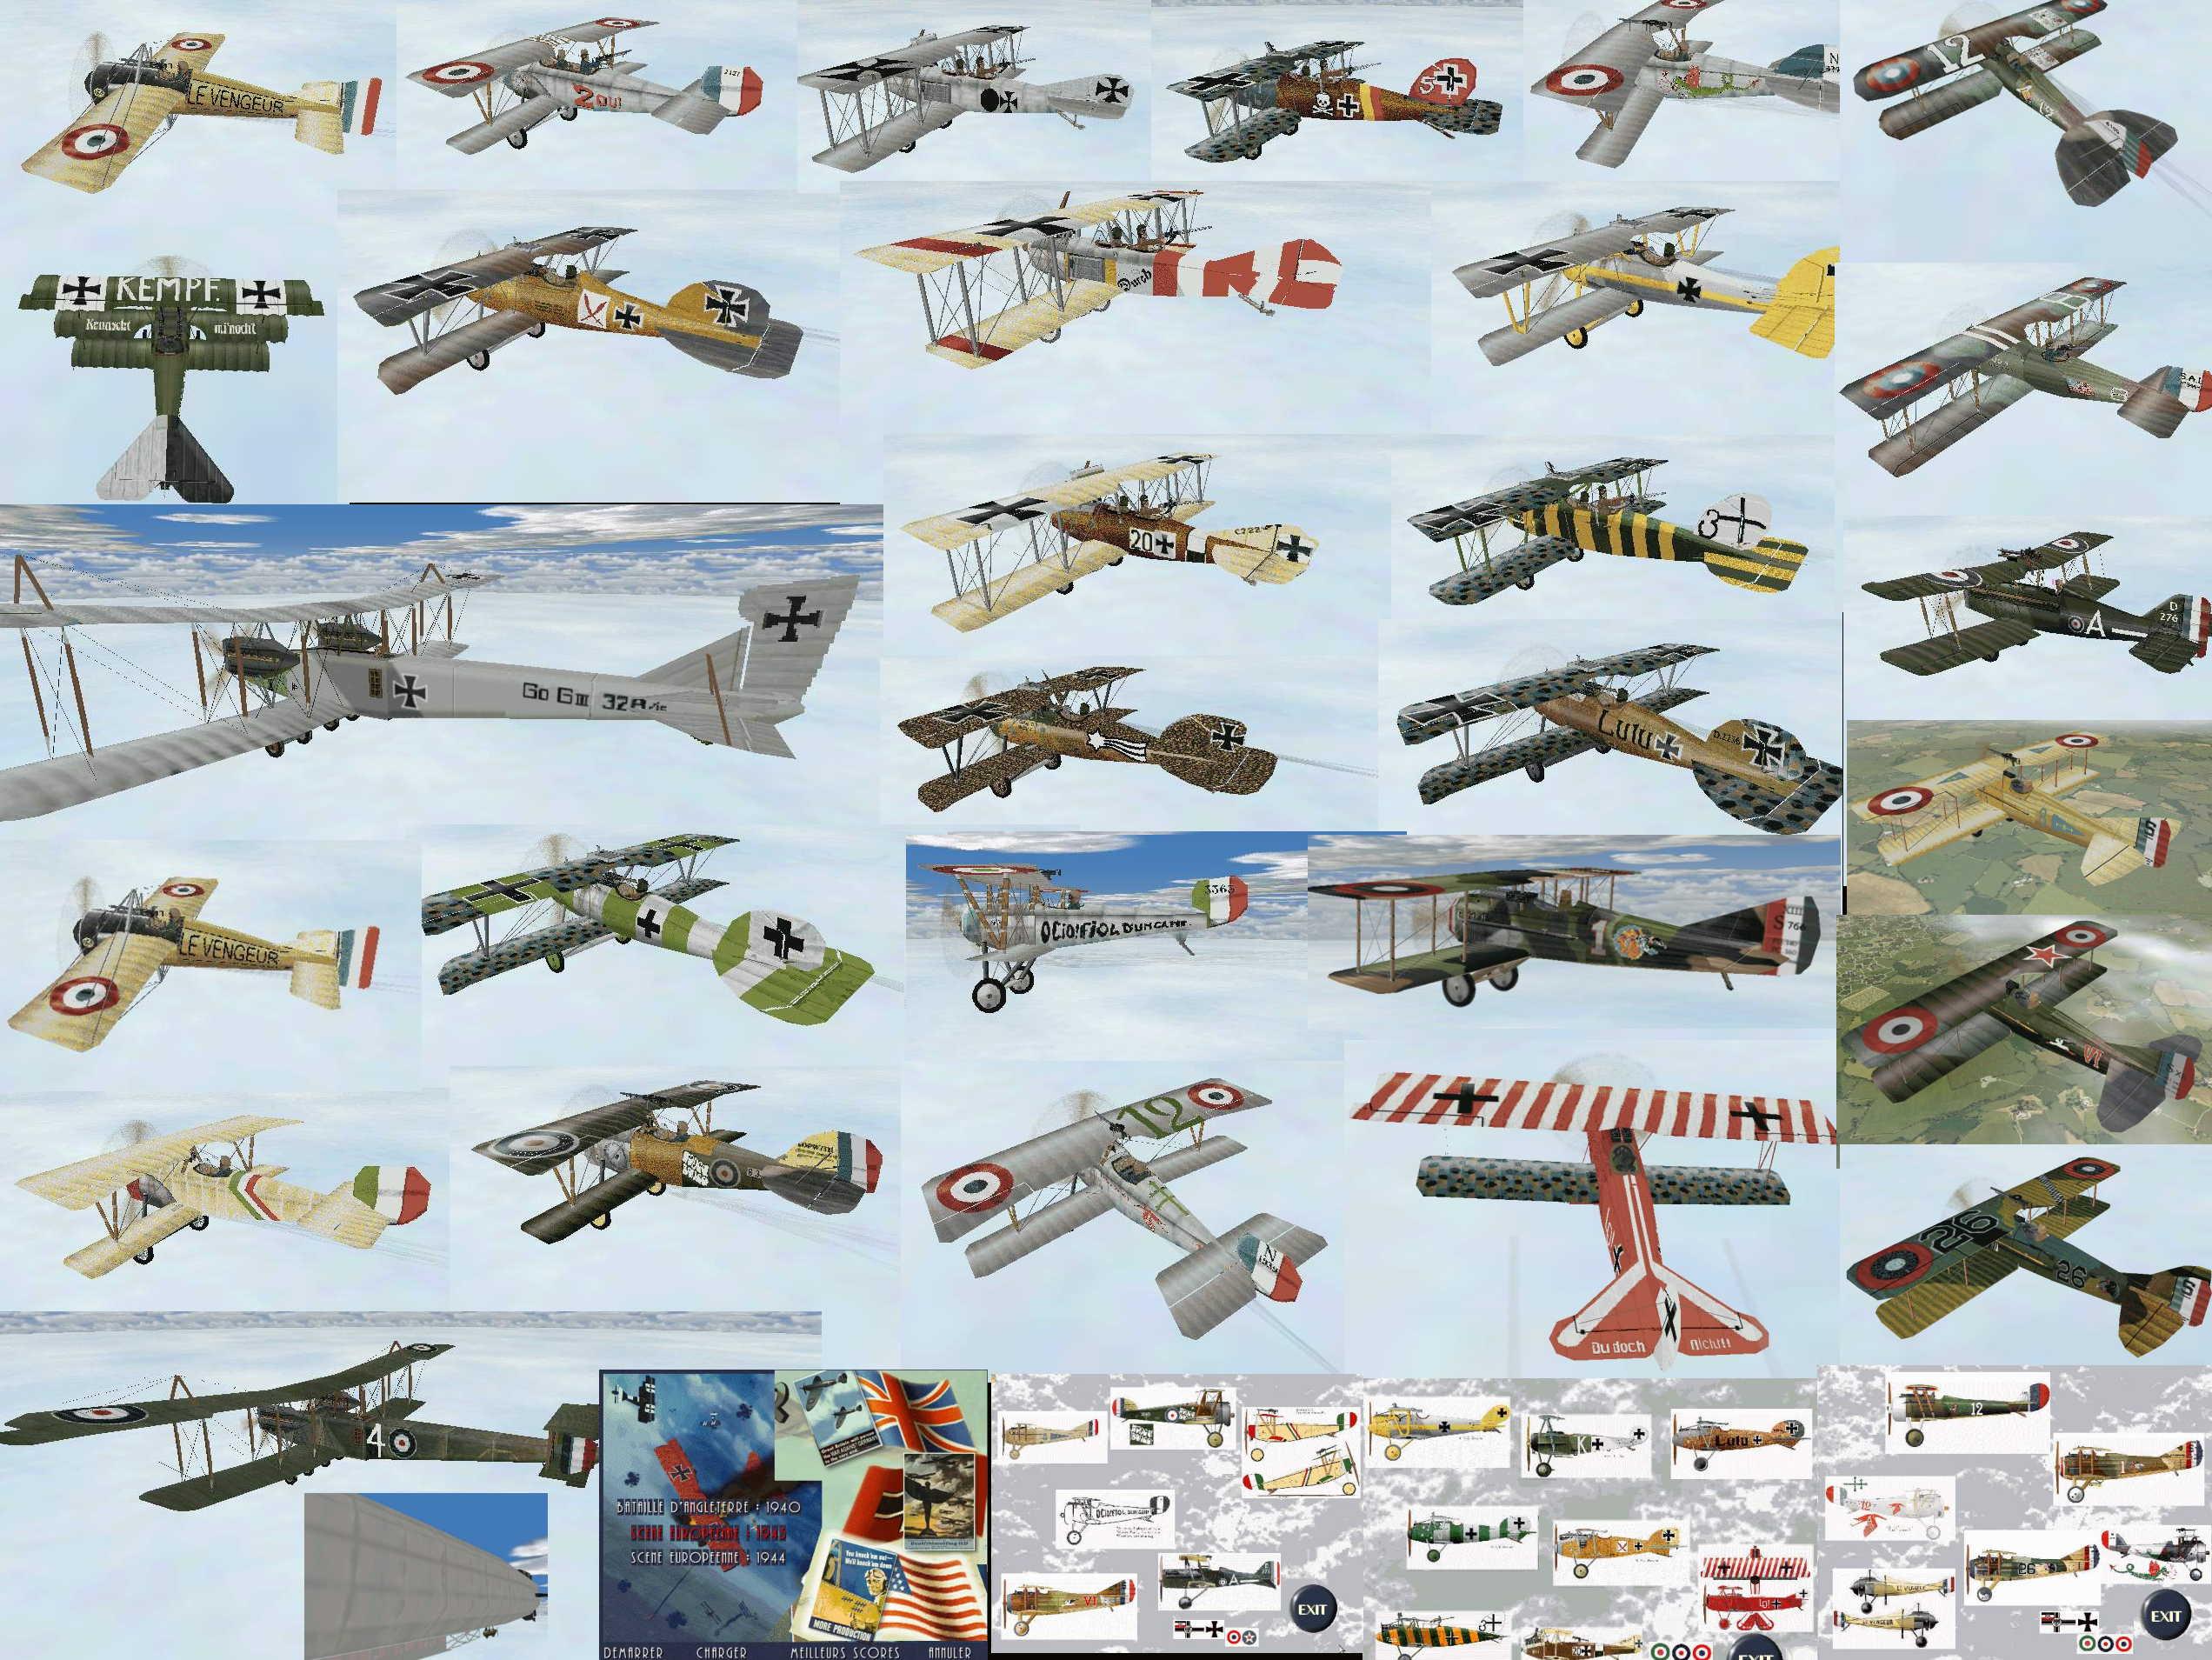 EAW WW1 mod Planes menus house edit